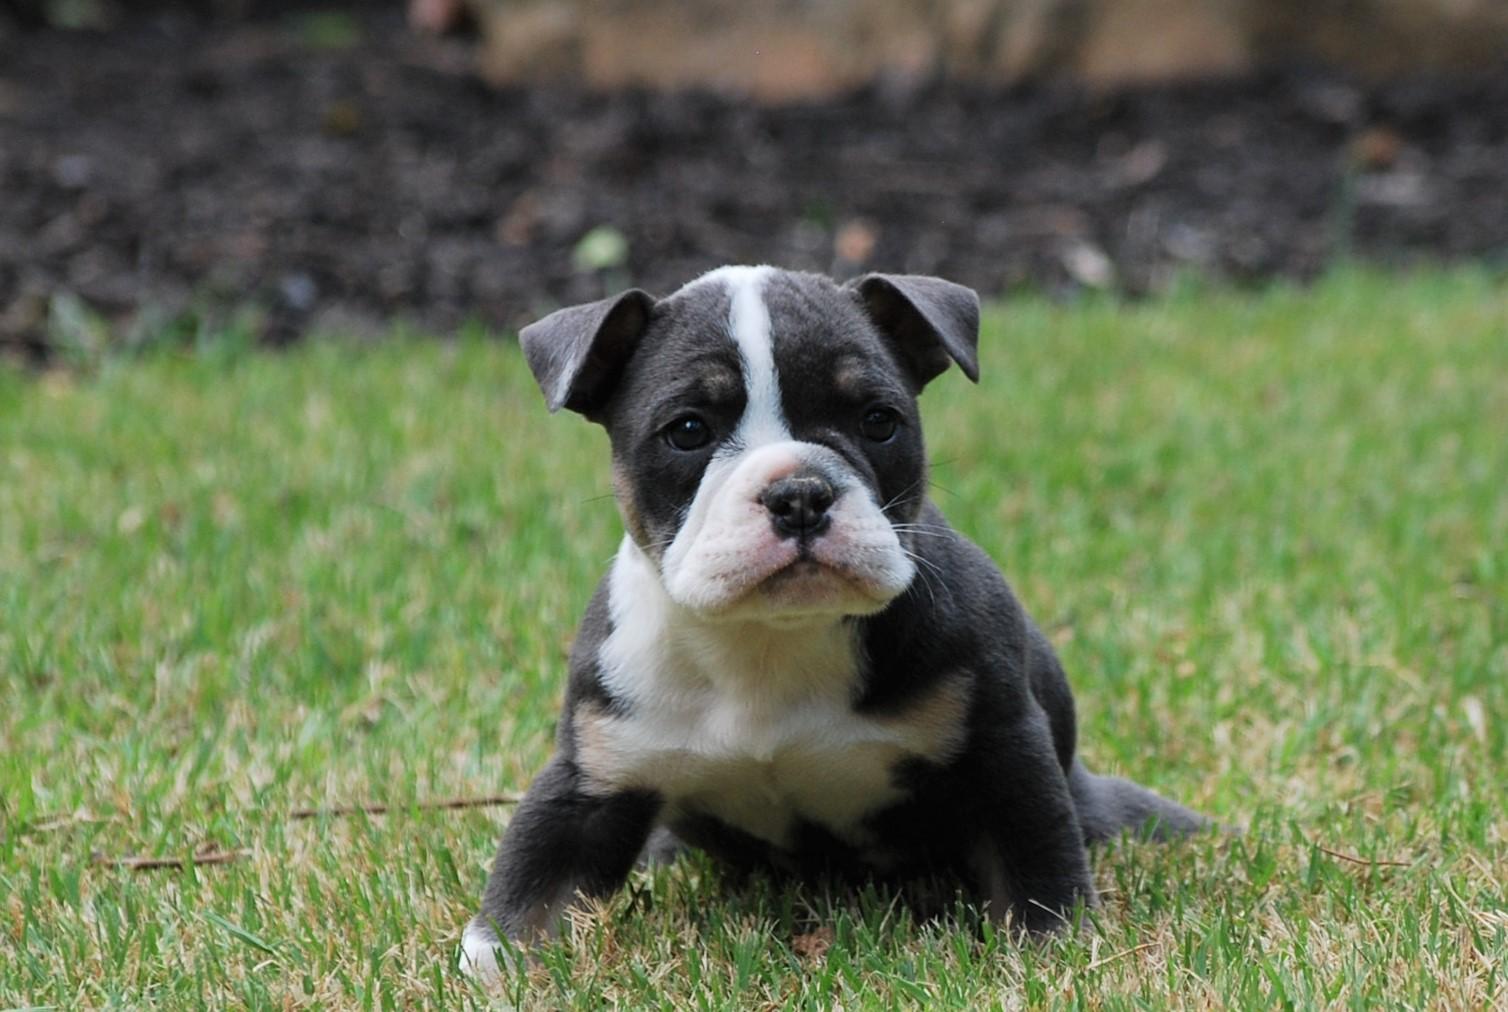 Vinny Olde English Bulldogge Puppy For Sale | Photo 2